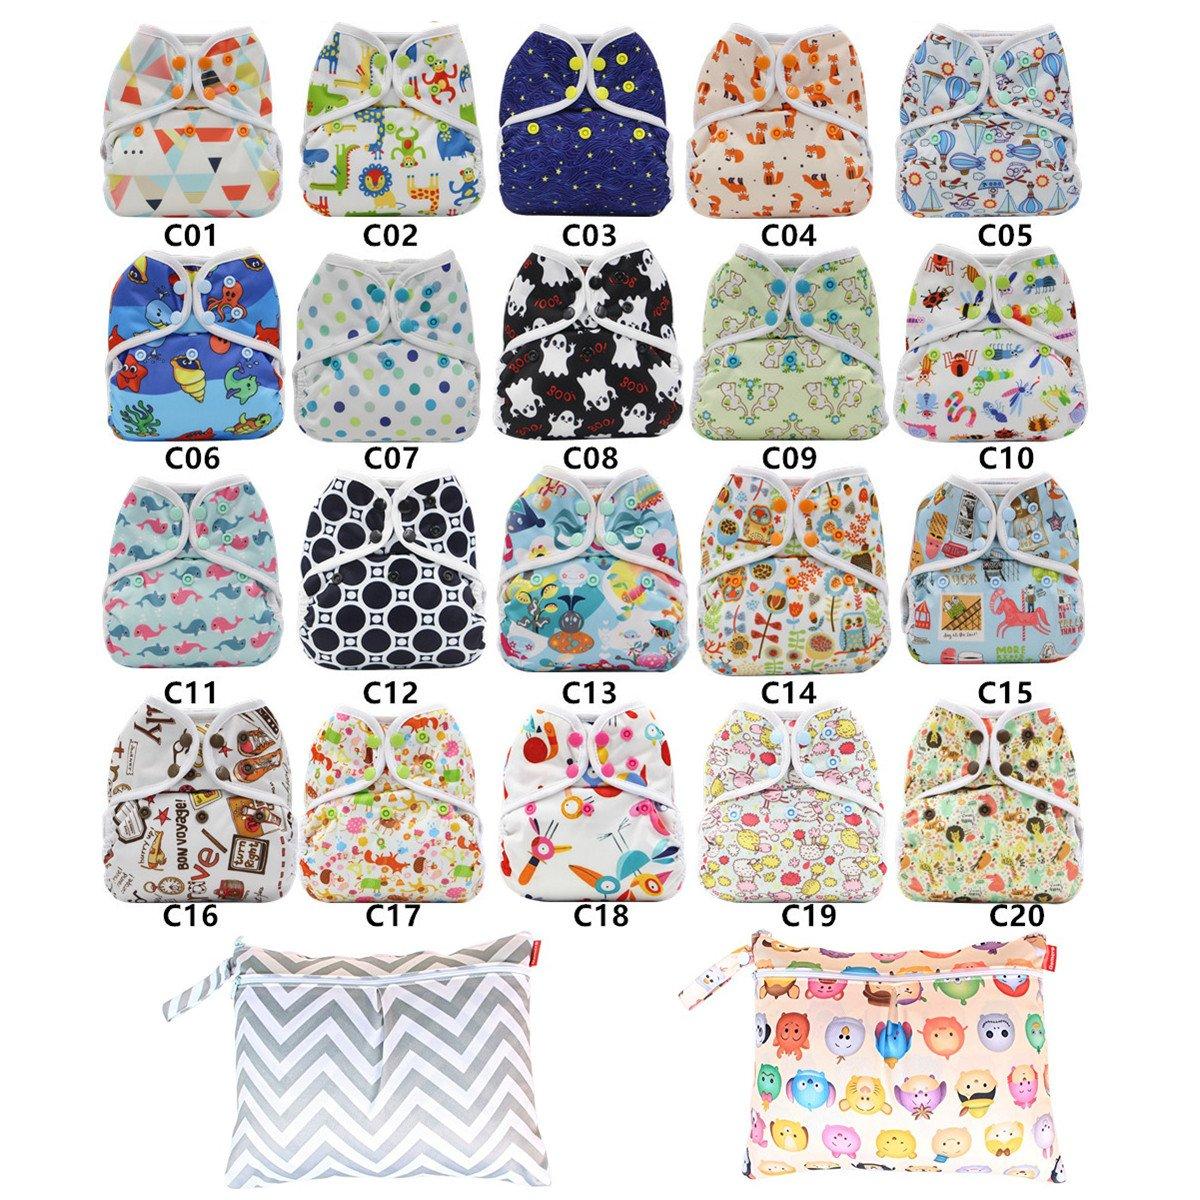 Newborn Infant Baby Cloth Diaper cover, Reusable, Washable, Adjustable (3PCS Diaper Cover+1 Wet Bag) CN